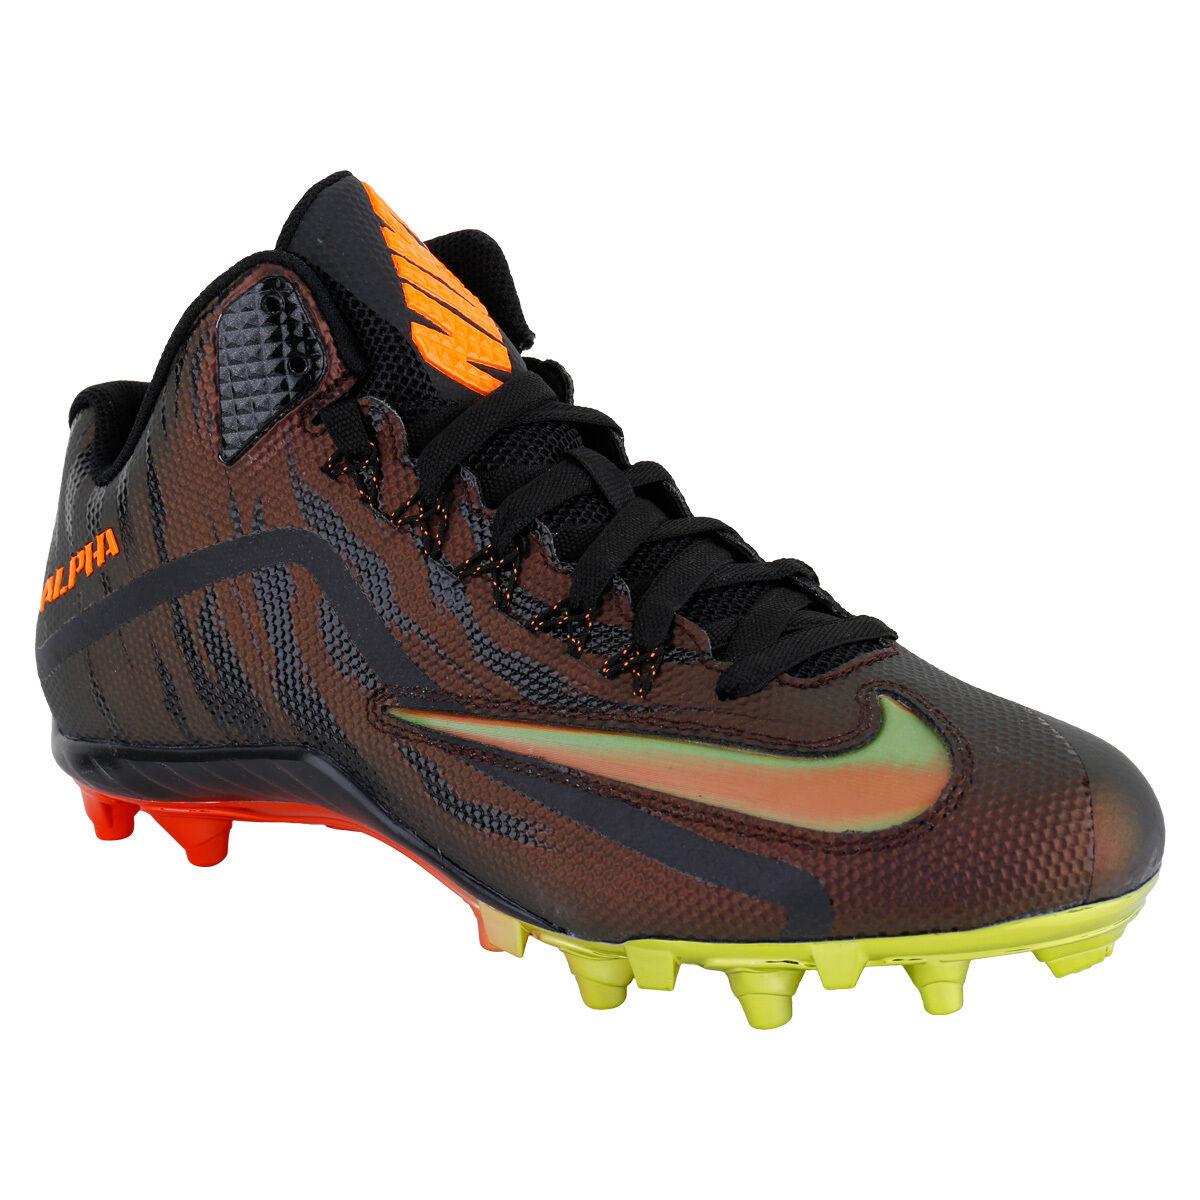 NIKE ALPHA PRO 2 3 4 TD LE MID MEN'S FOOTBALL CLEATS 820280-878 MSRP